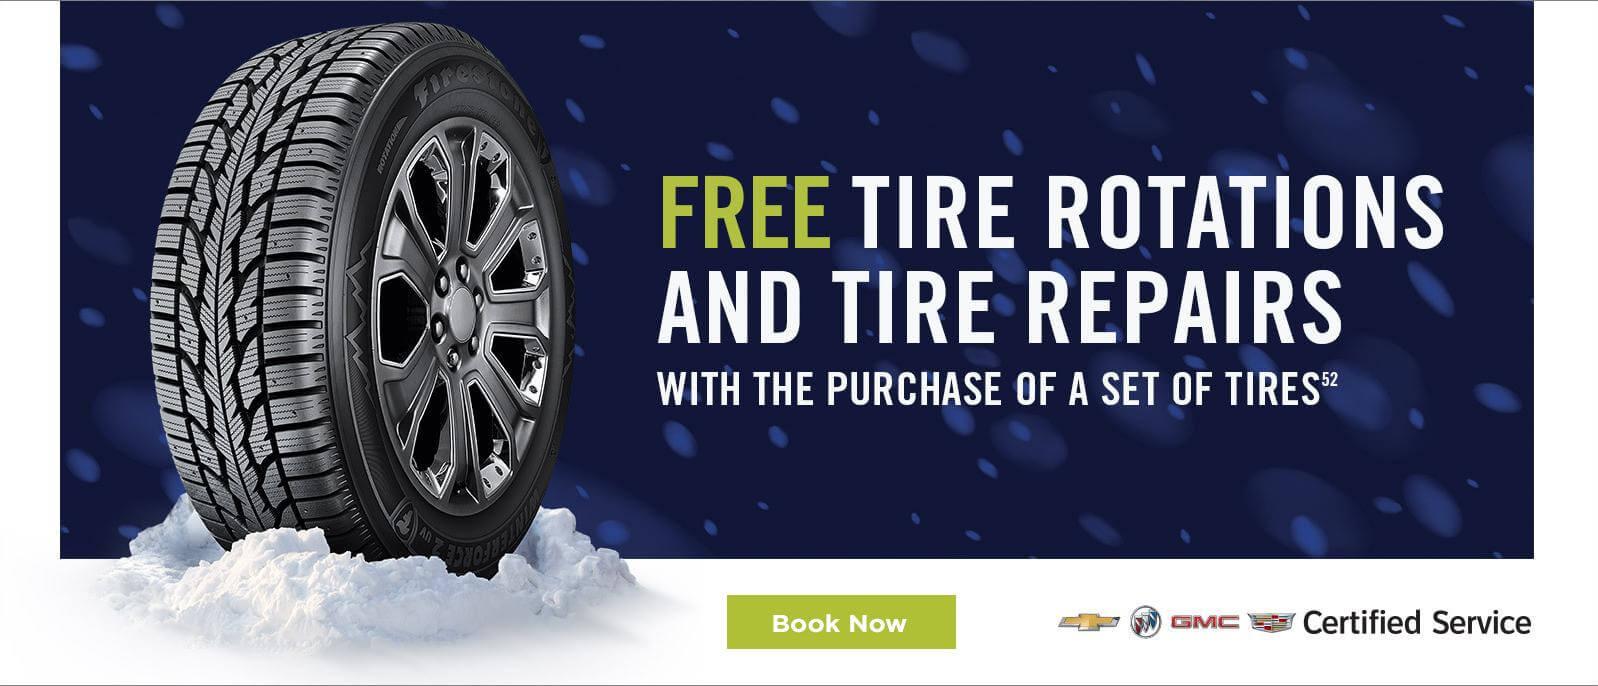 Tire Repairs offer